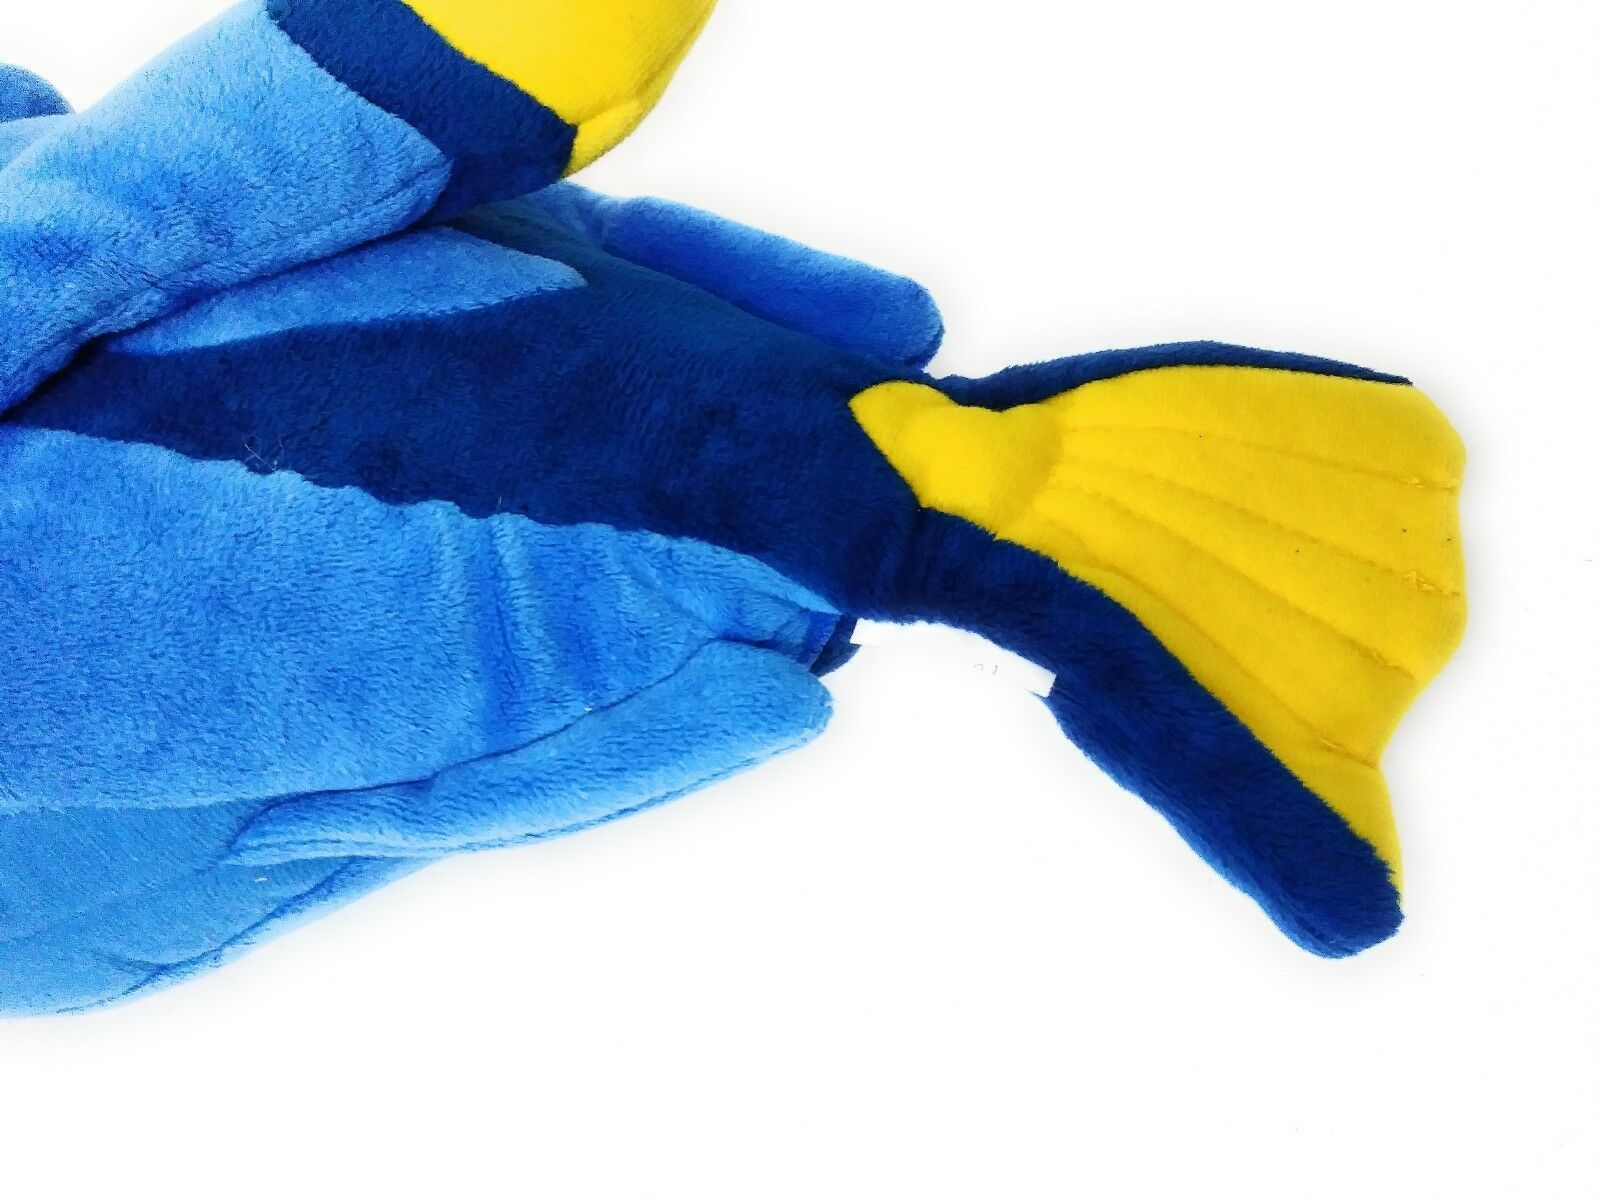 "13"" Disney Pixar Finding Nemo Dory Plush Stuffed Animal Movie Big Blue Fish"